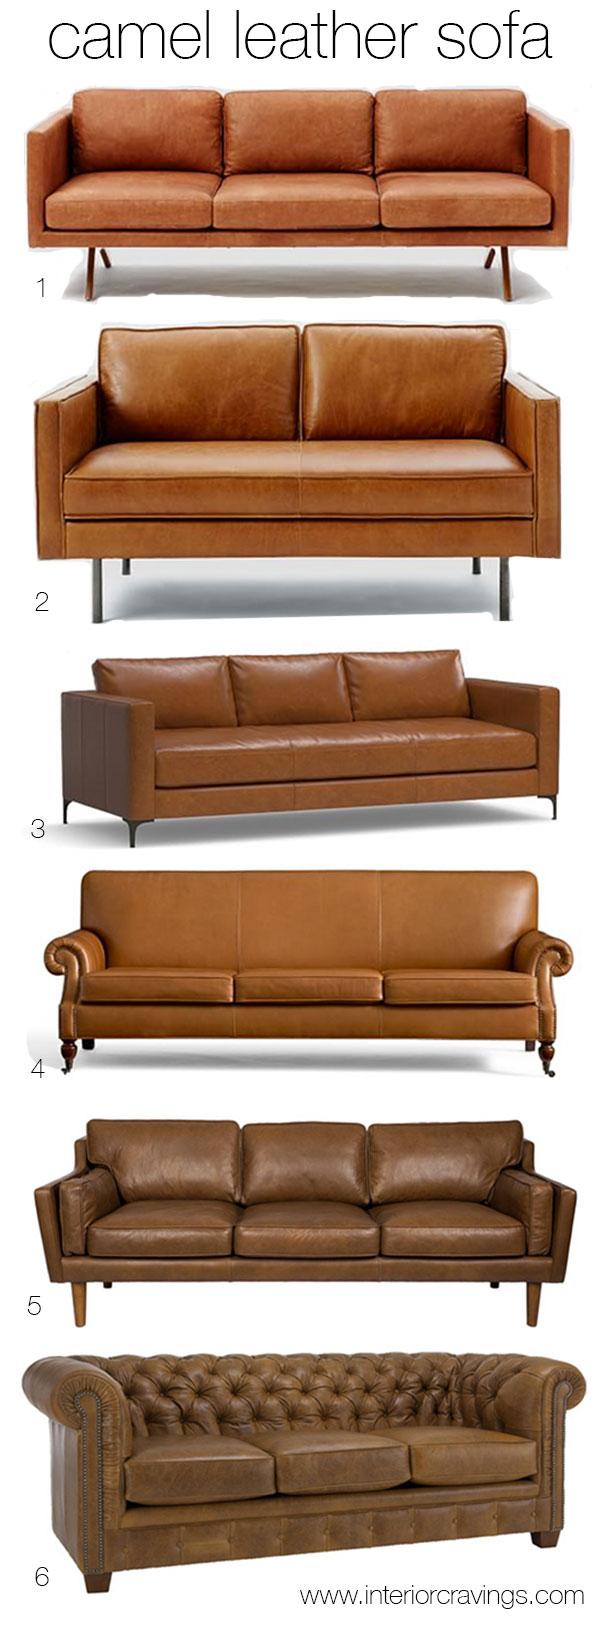 West Elm Leather Sofa Used